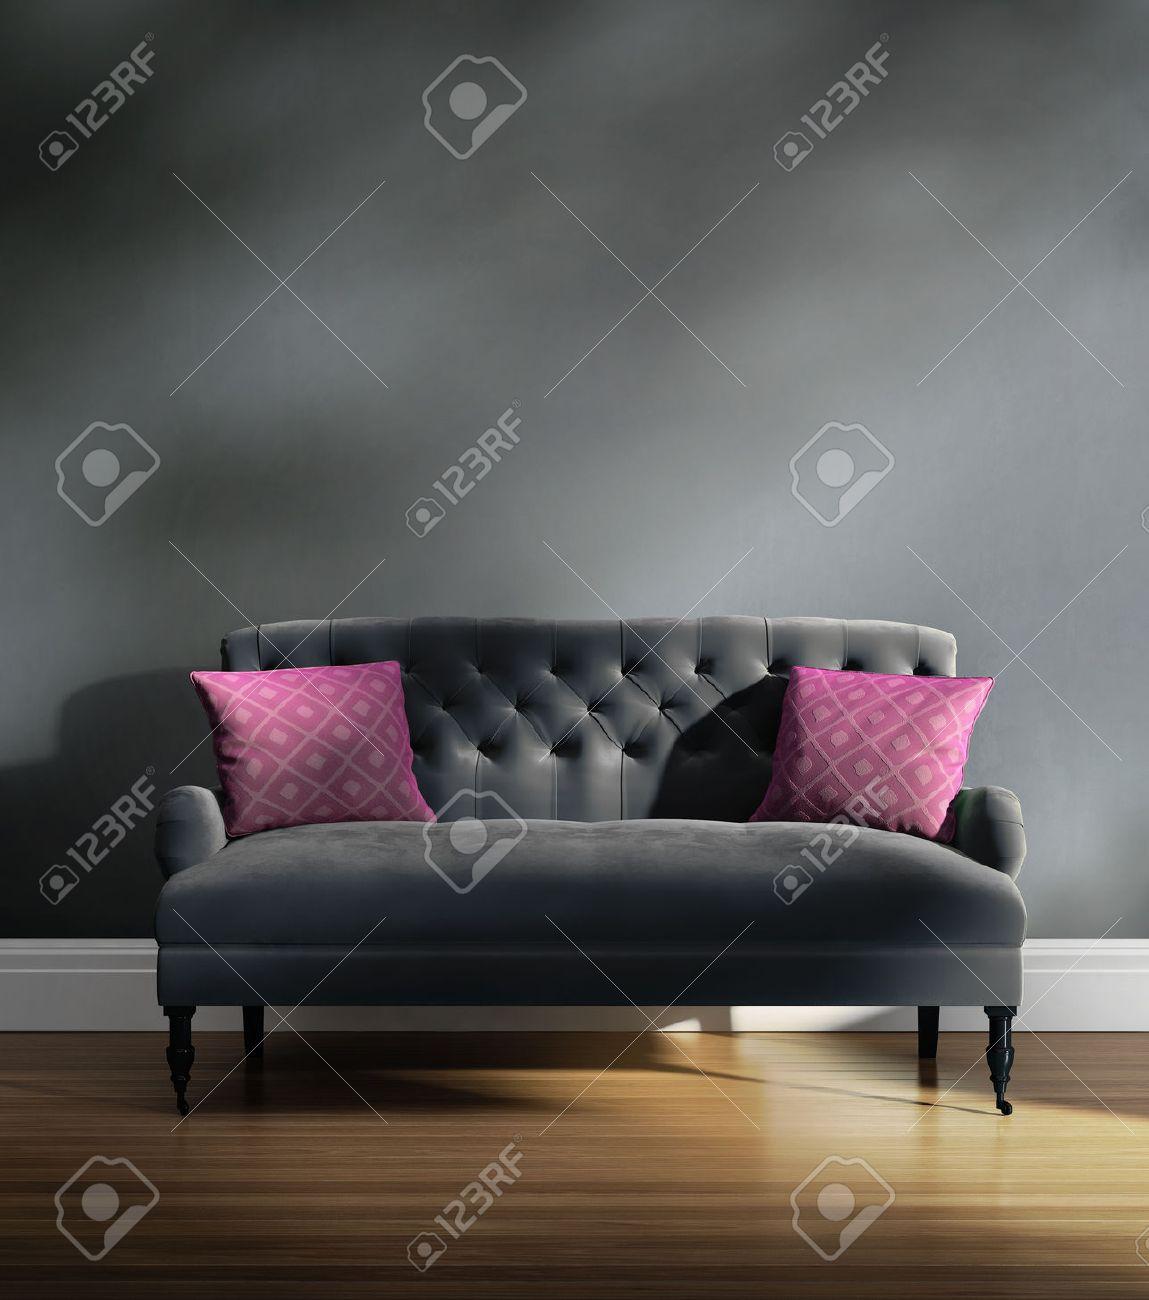 Contemporary Elegant Luxury Grey Velvet Sofa With Pink Cushions ...